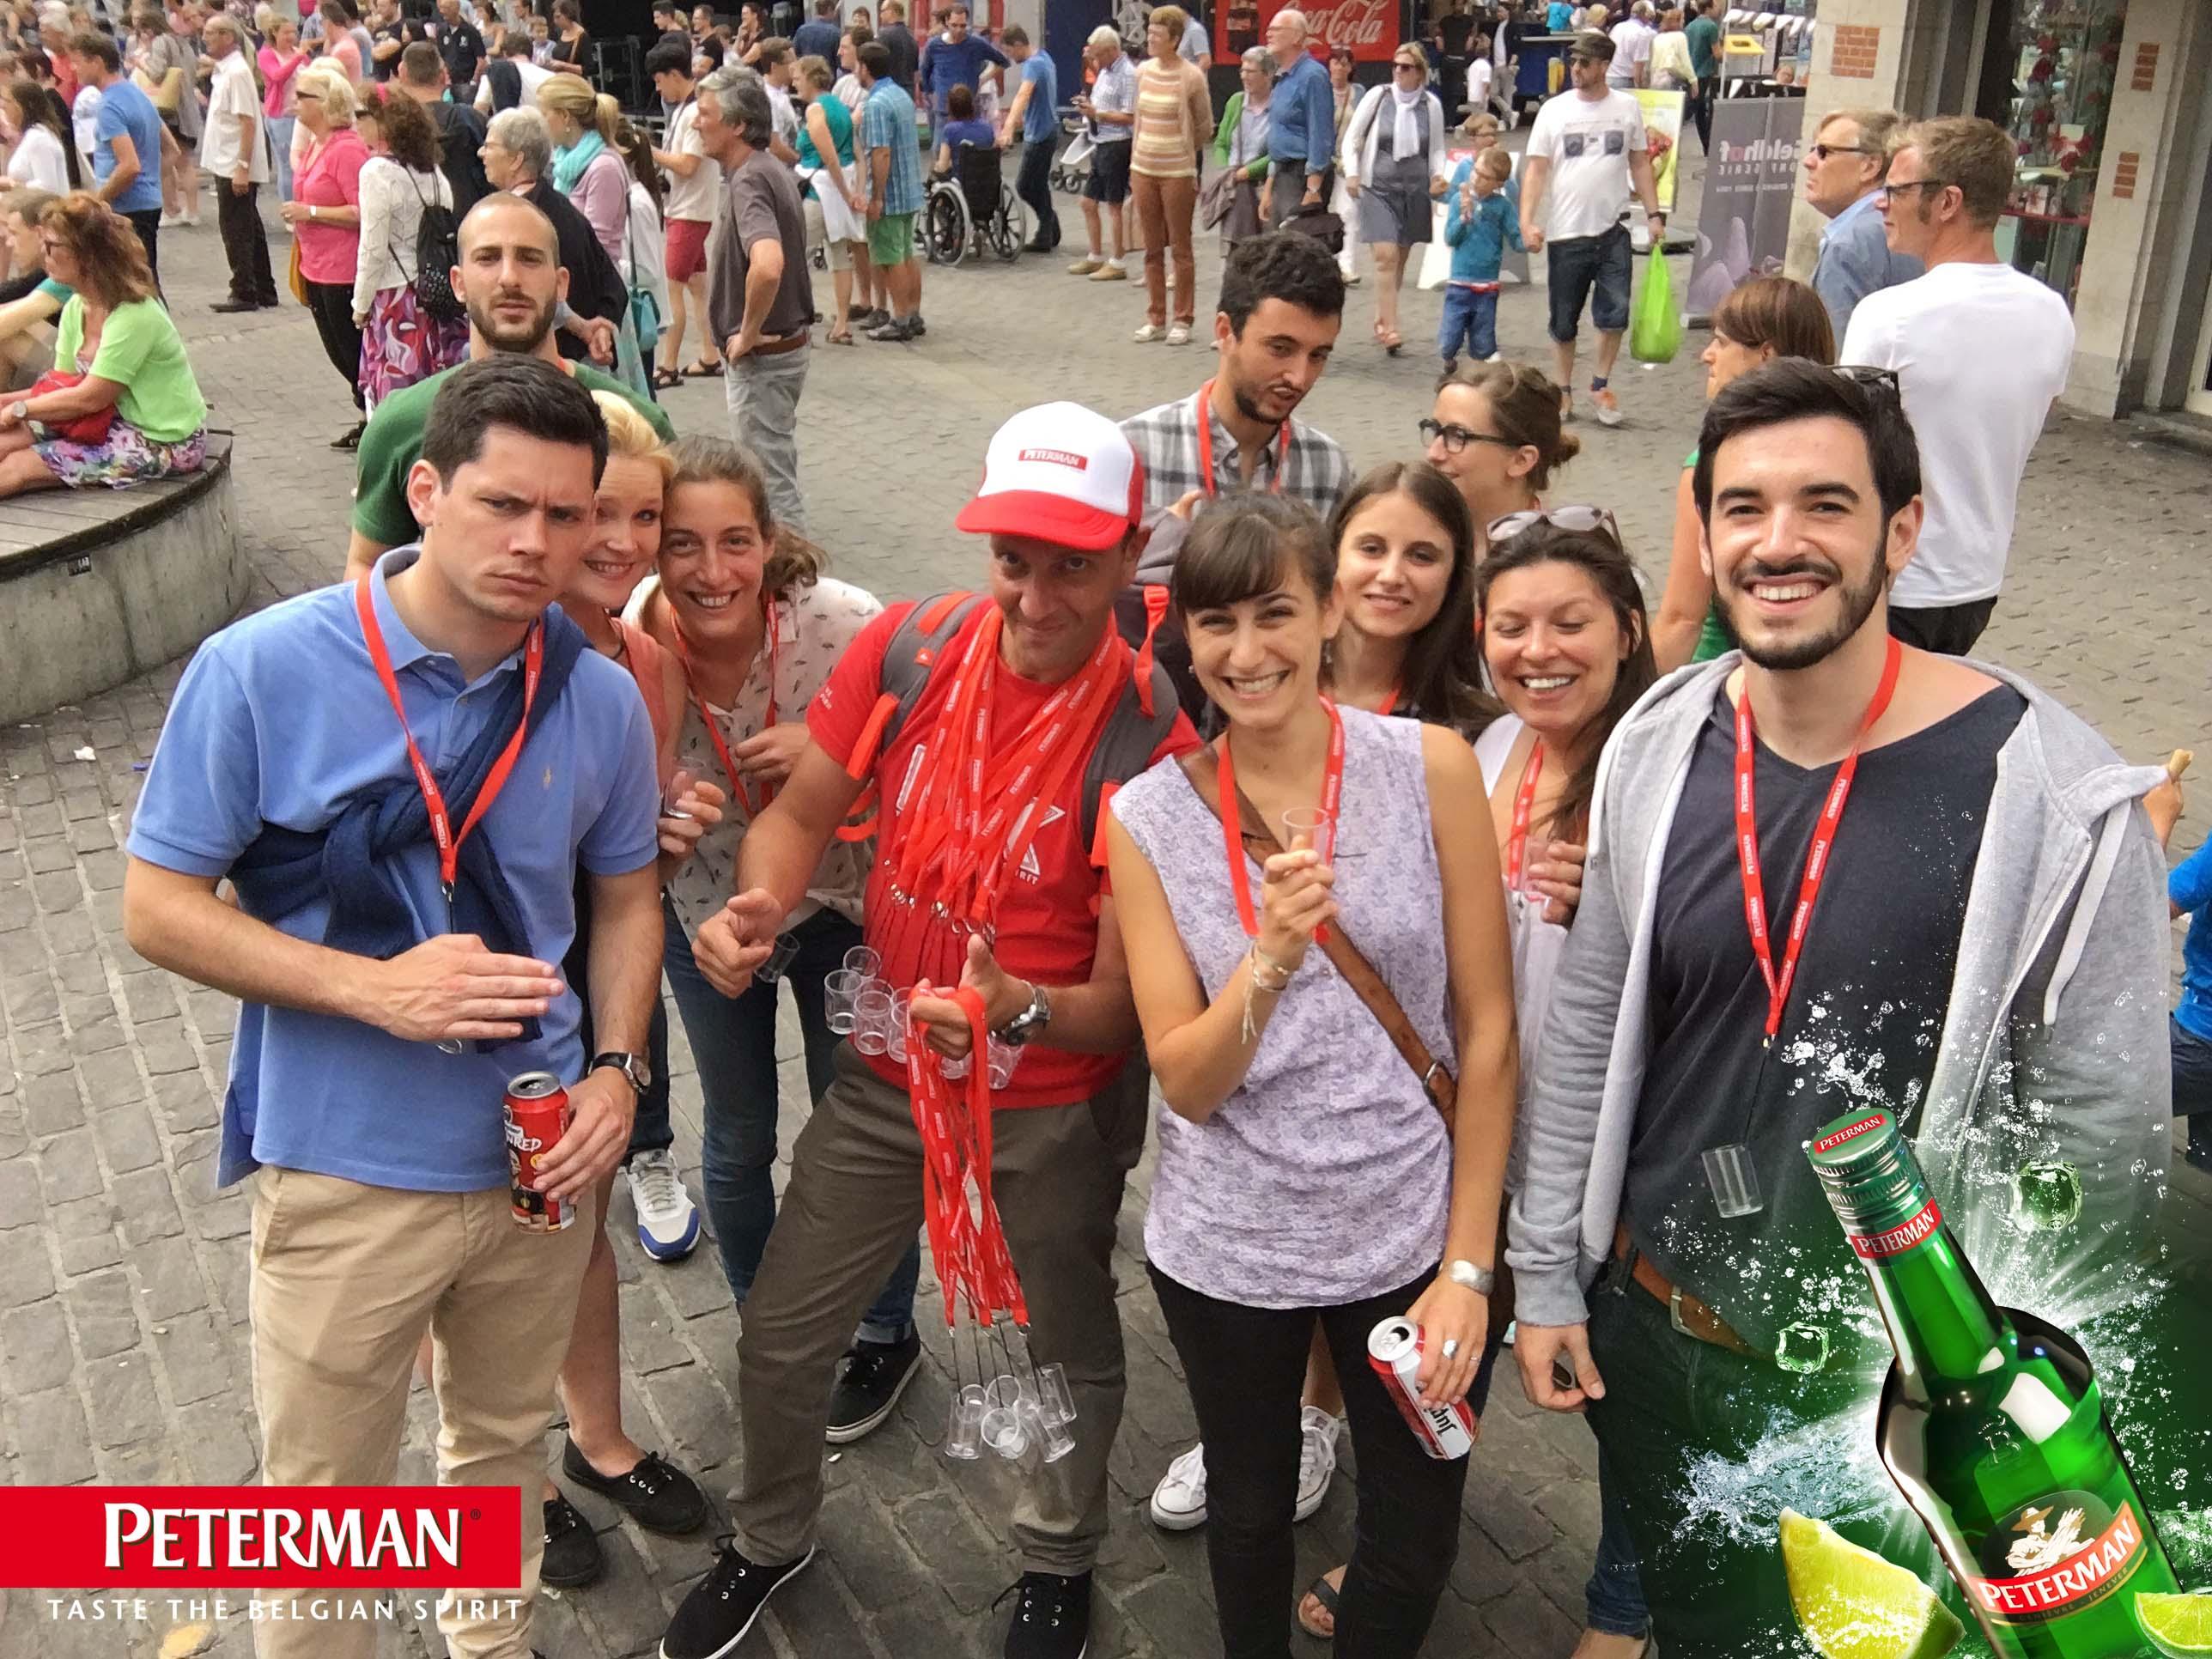 Peterman_Gent_23-24_B_2016_0062